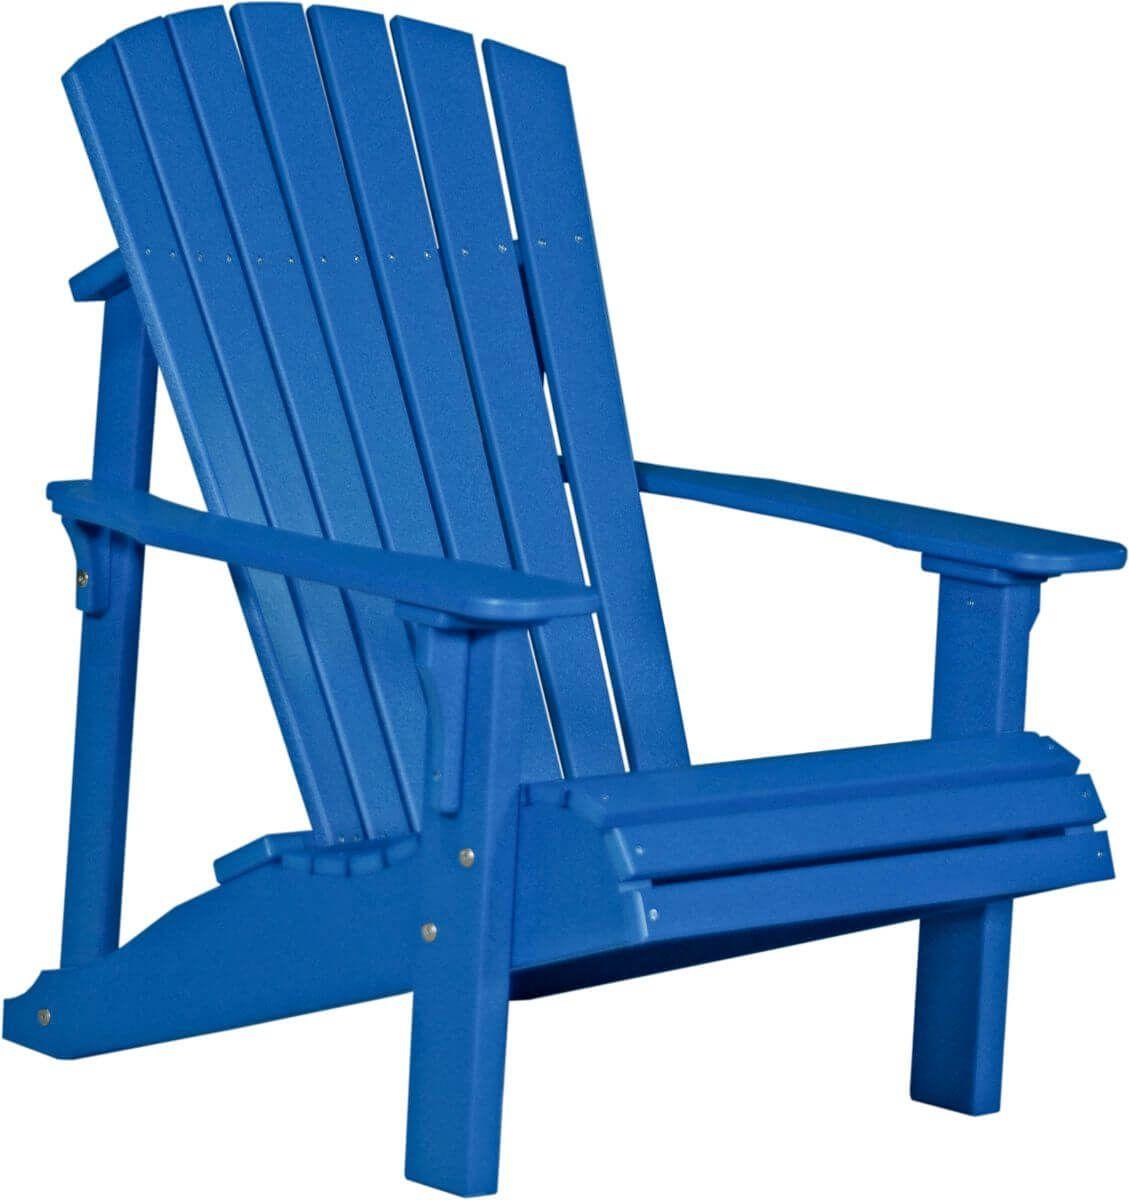 Blue Rockaway Adirondack Chair